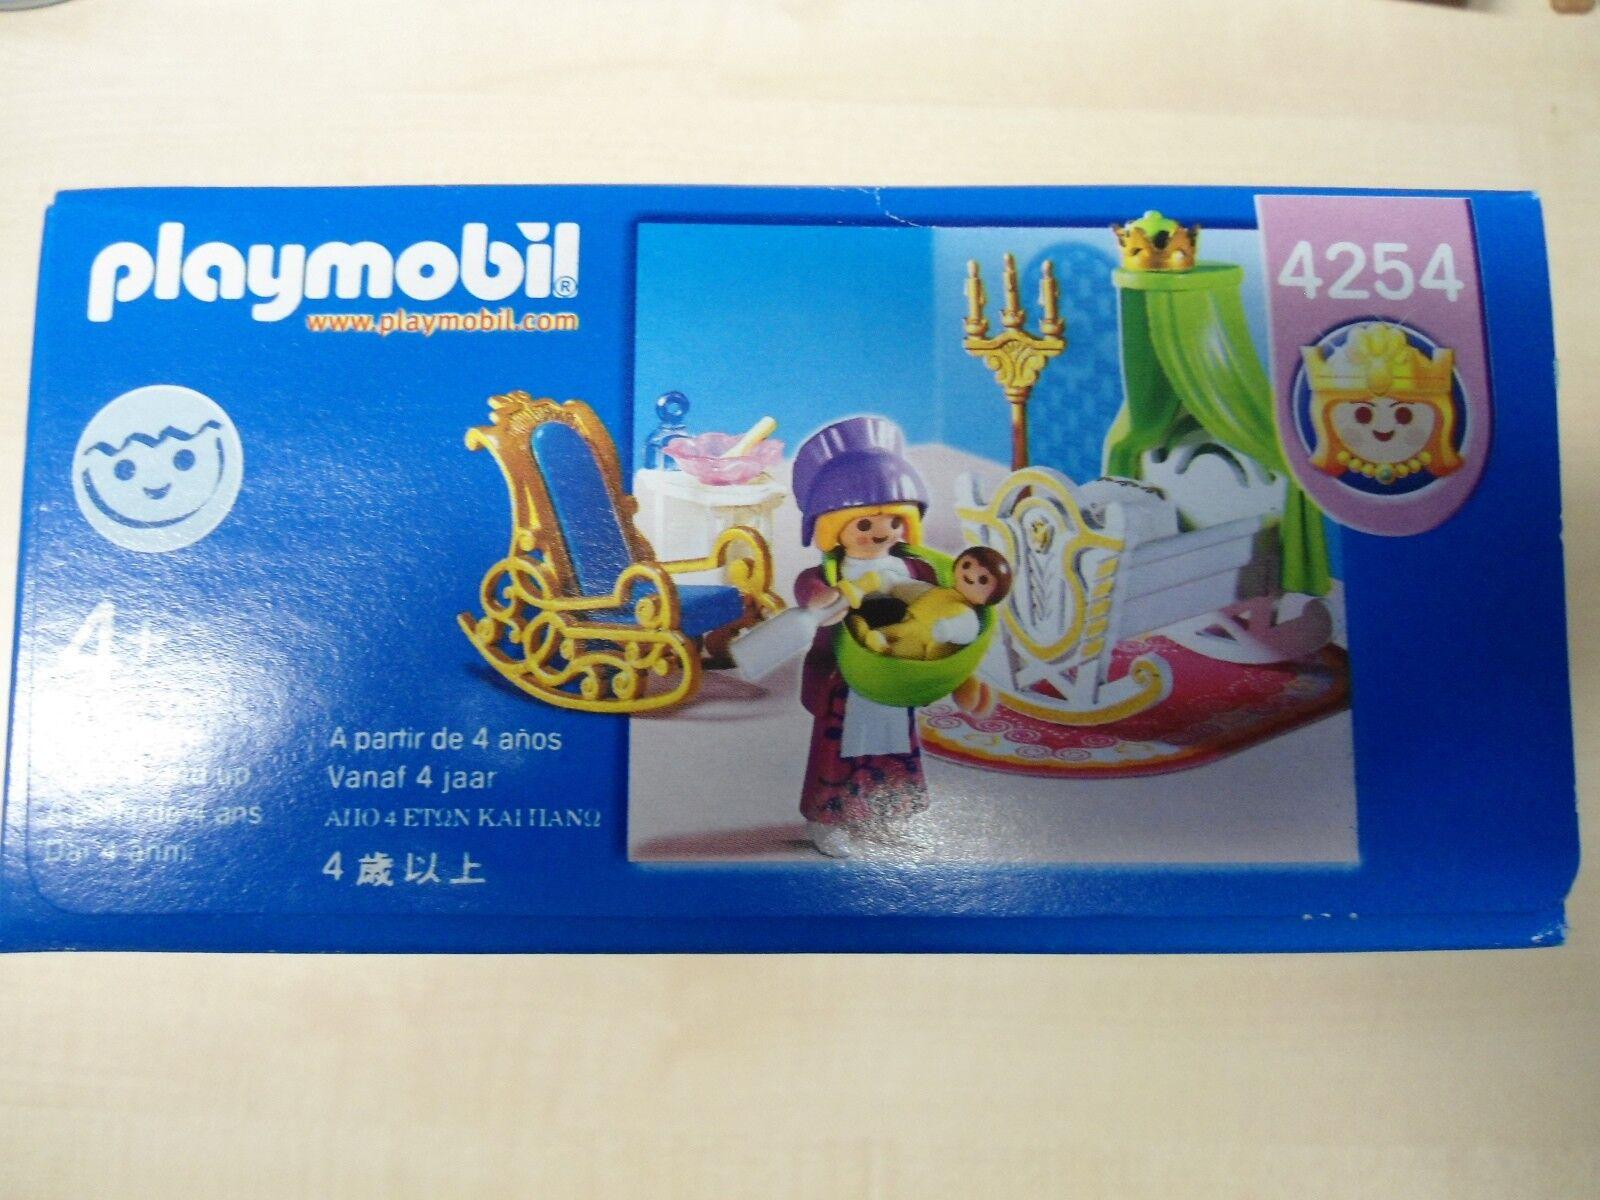 Playmobil Playmobil Playmobil Set  4254  Babyzimmer   Neu 49b12a